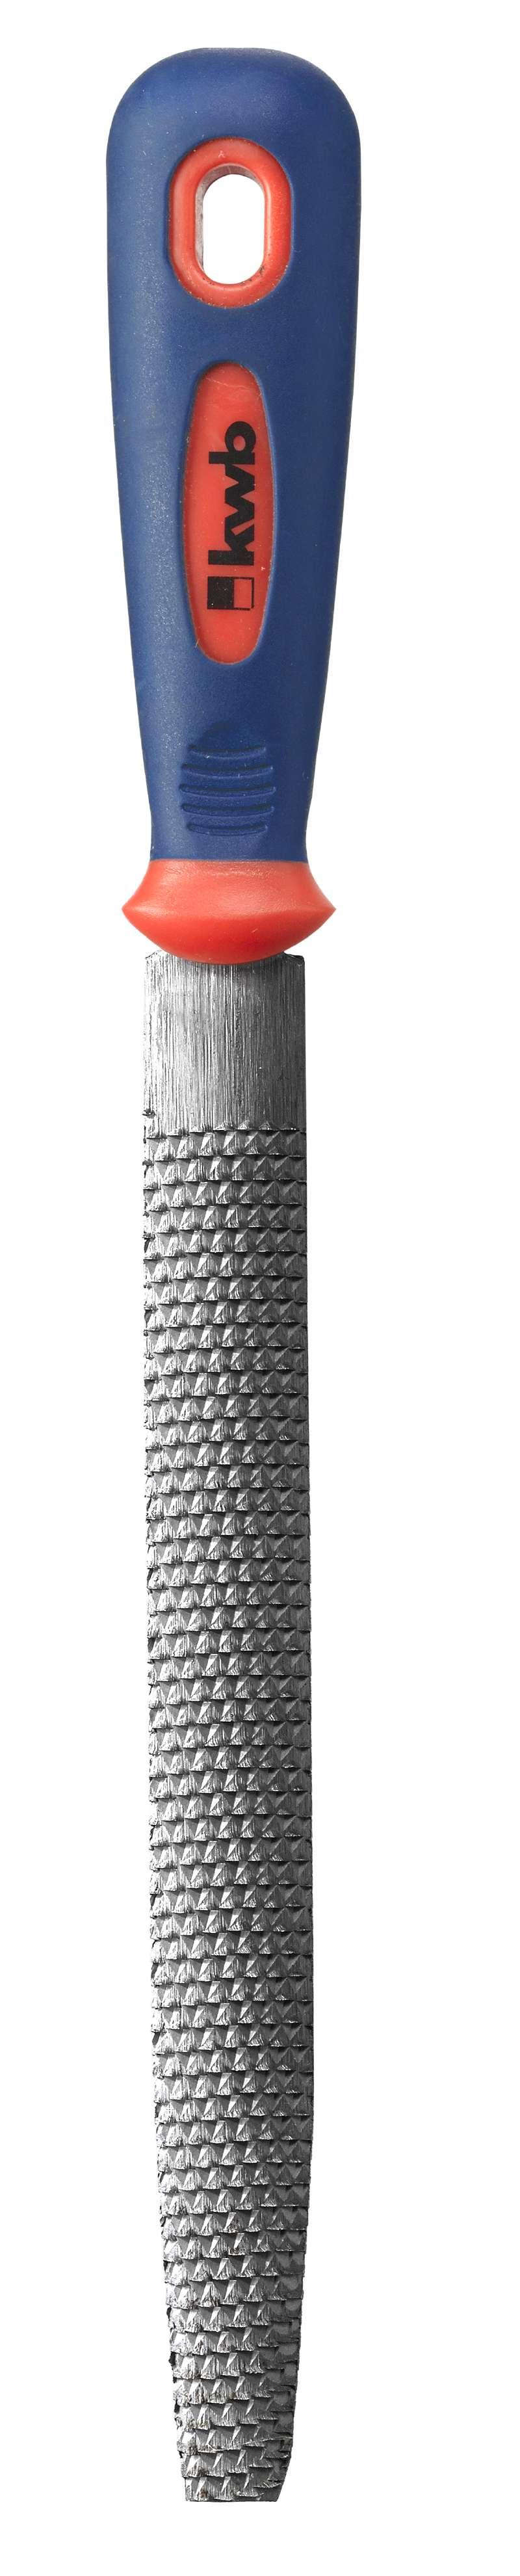 Рашпиль Kwb 4804-20 серьги